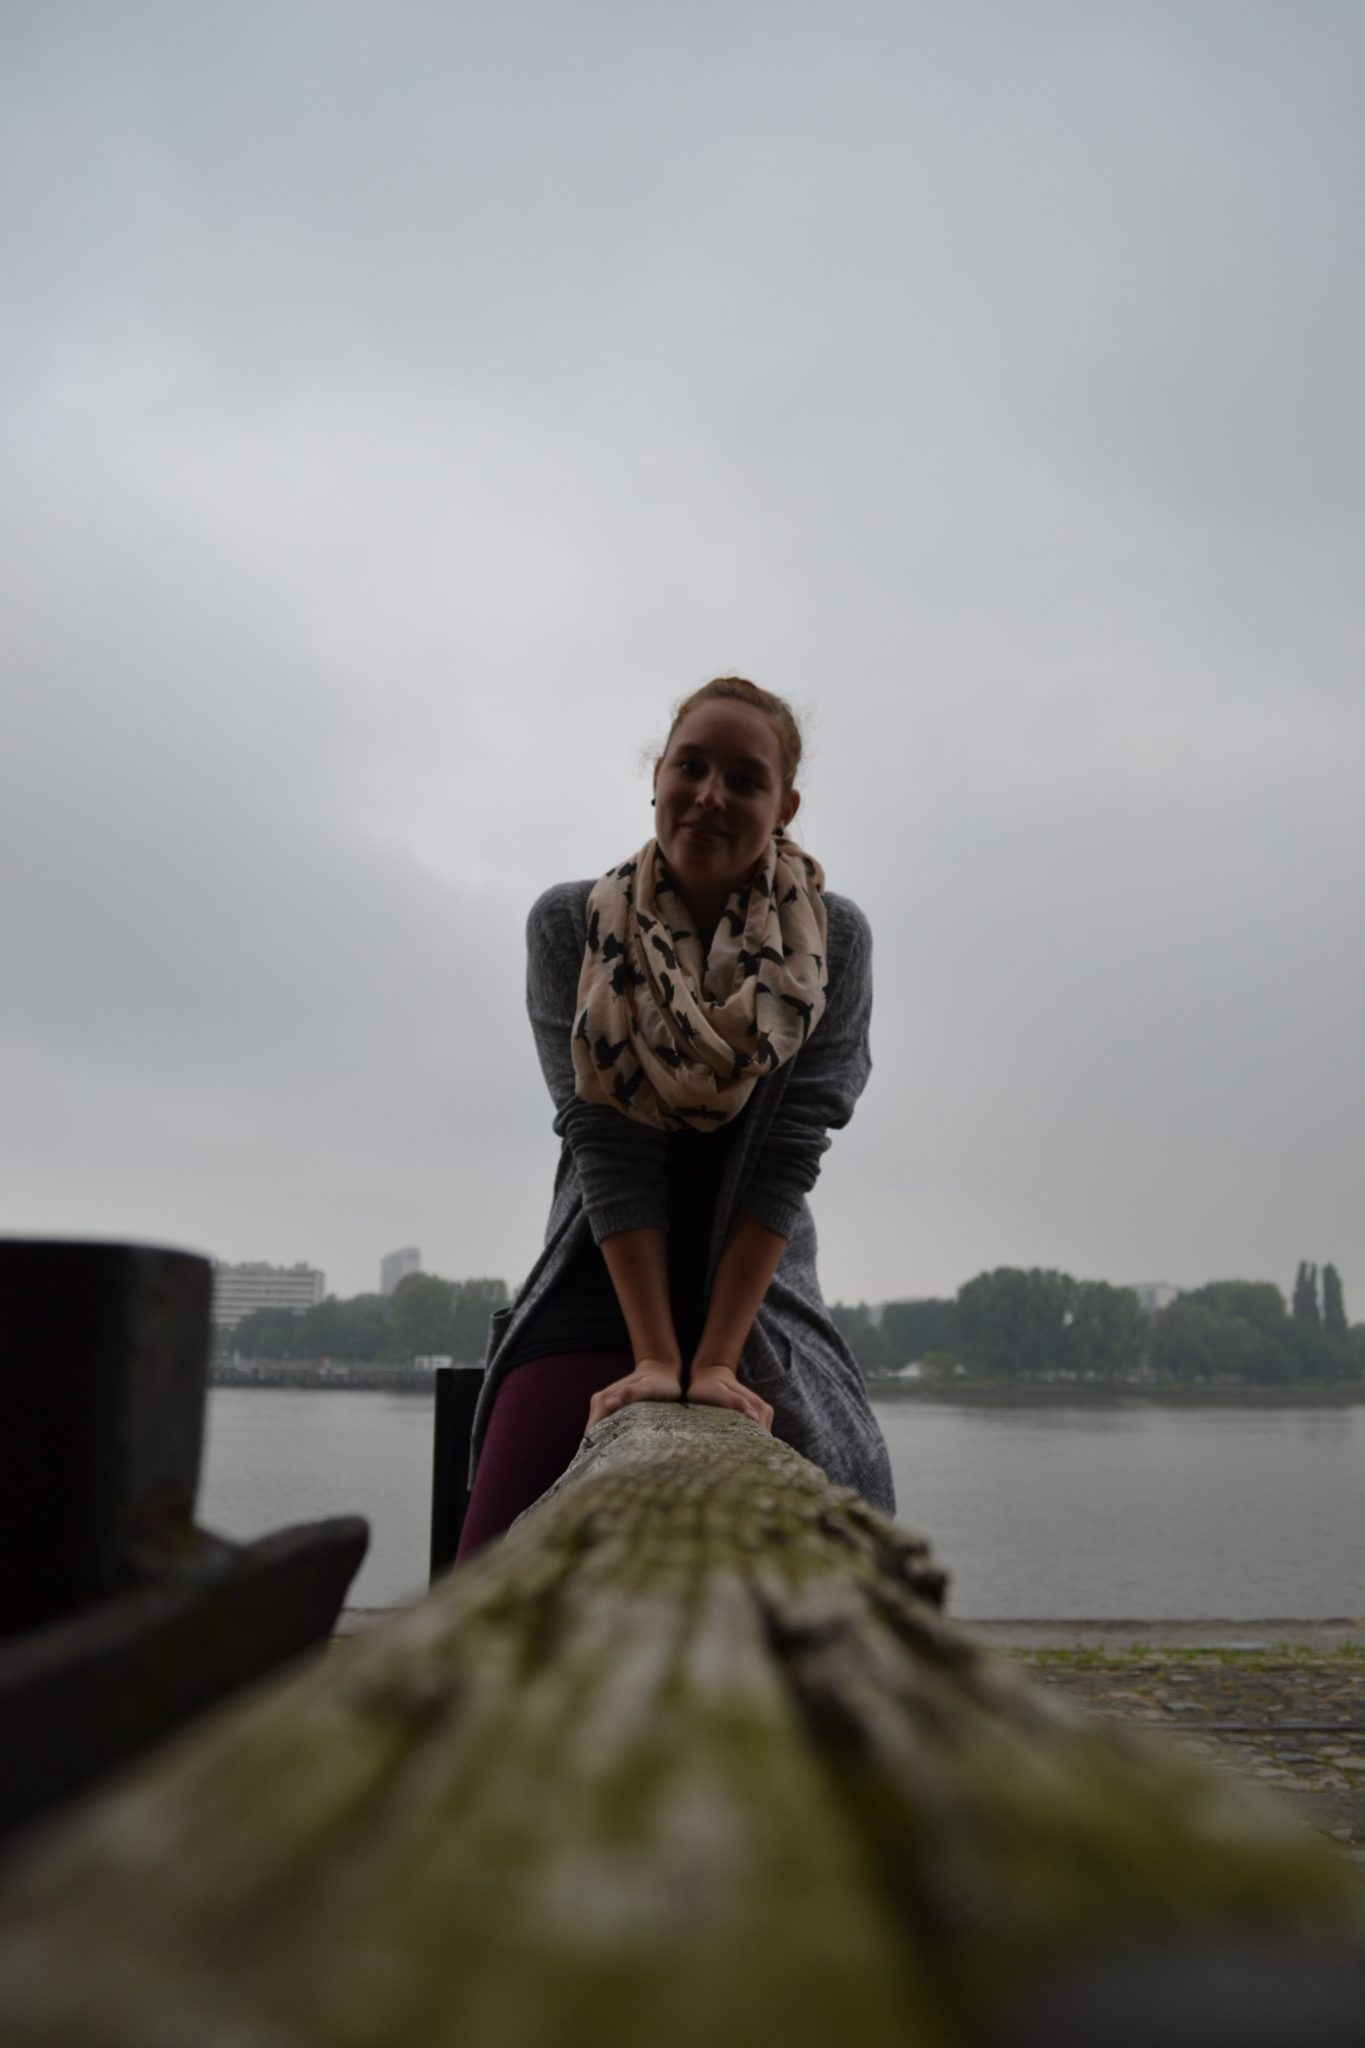 Travel Diary: Antwerpen | Belgium - dsc 0071